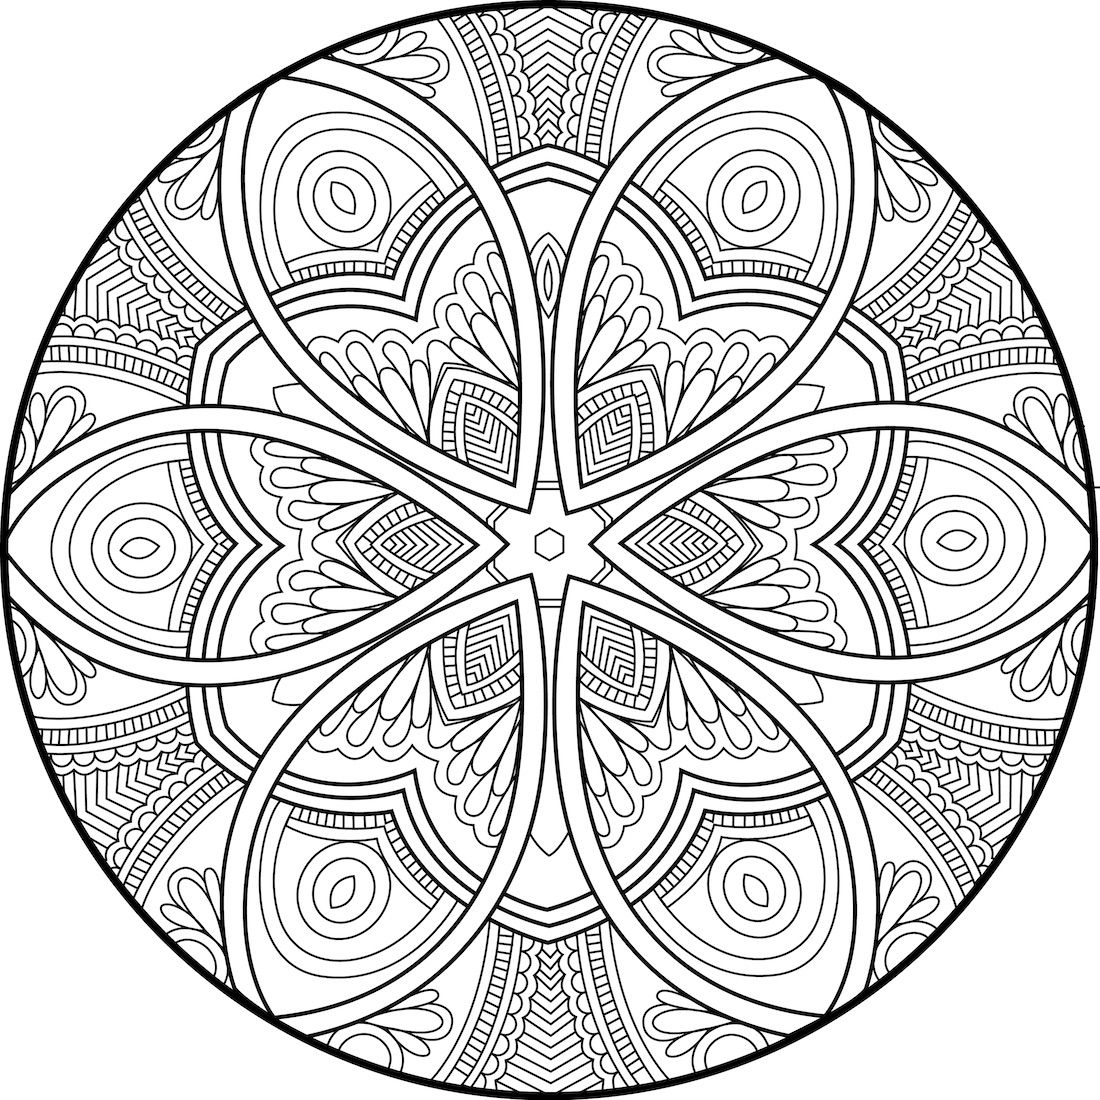 Pin de Jade Macintyre en Colour Me | Pinterest | Mandalas, Colorear ...